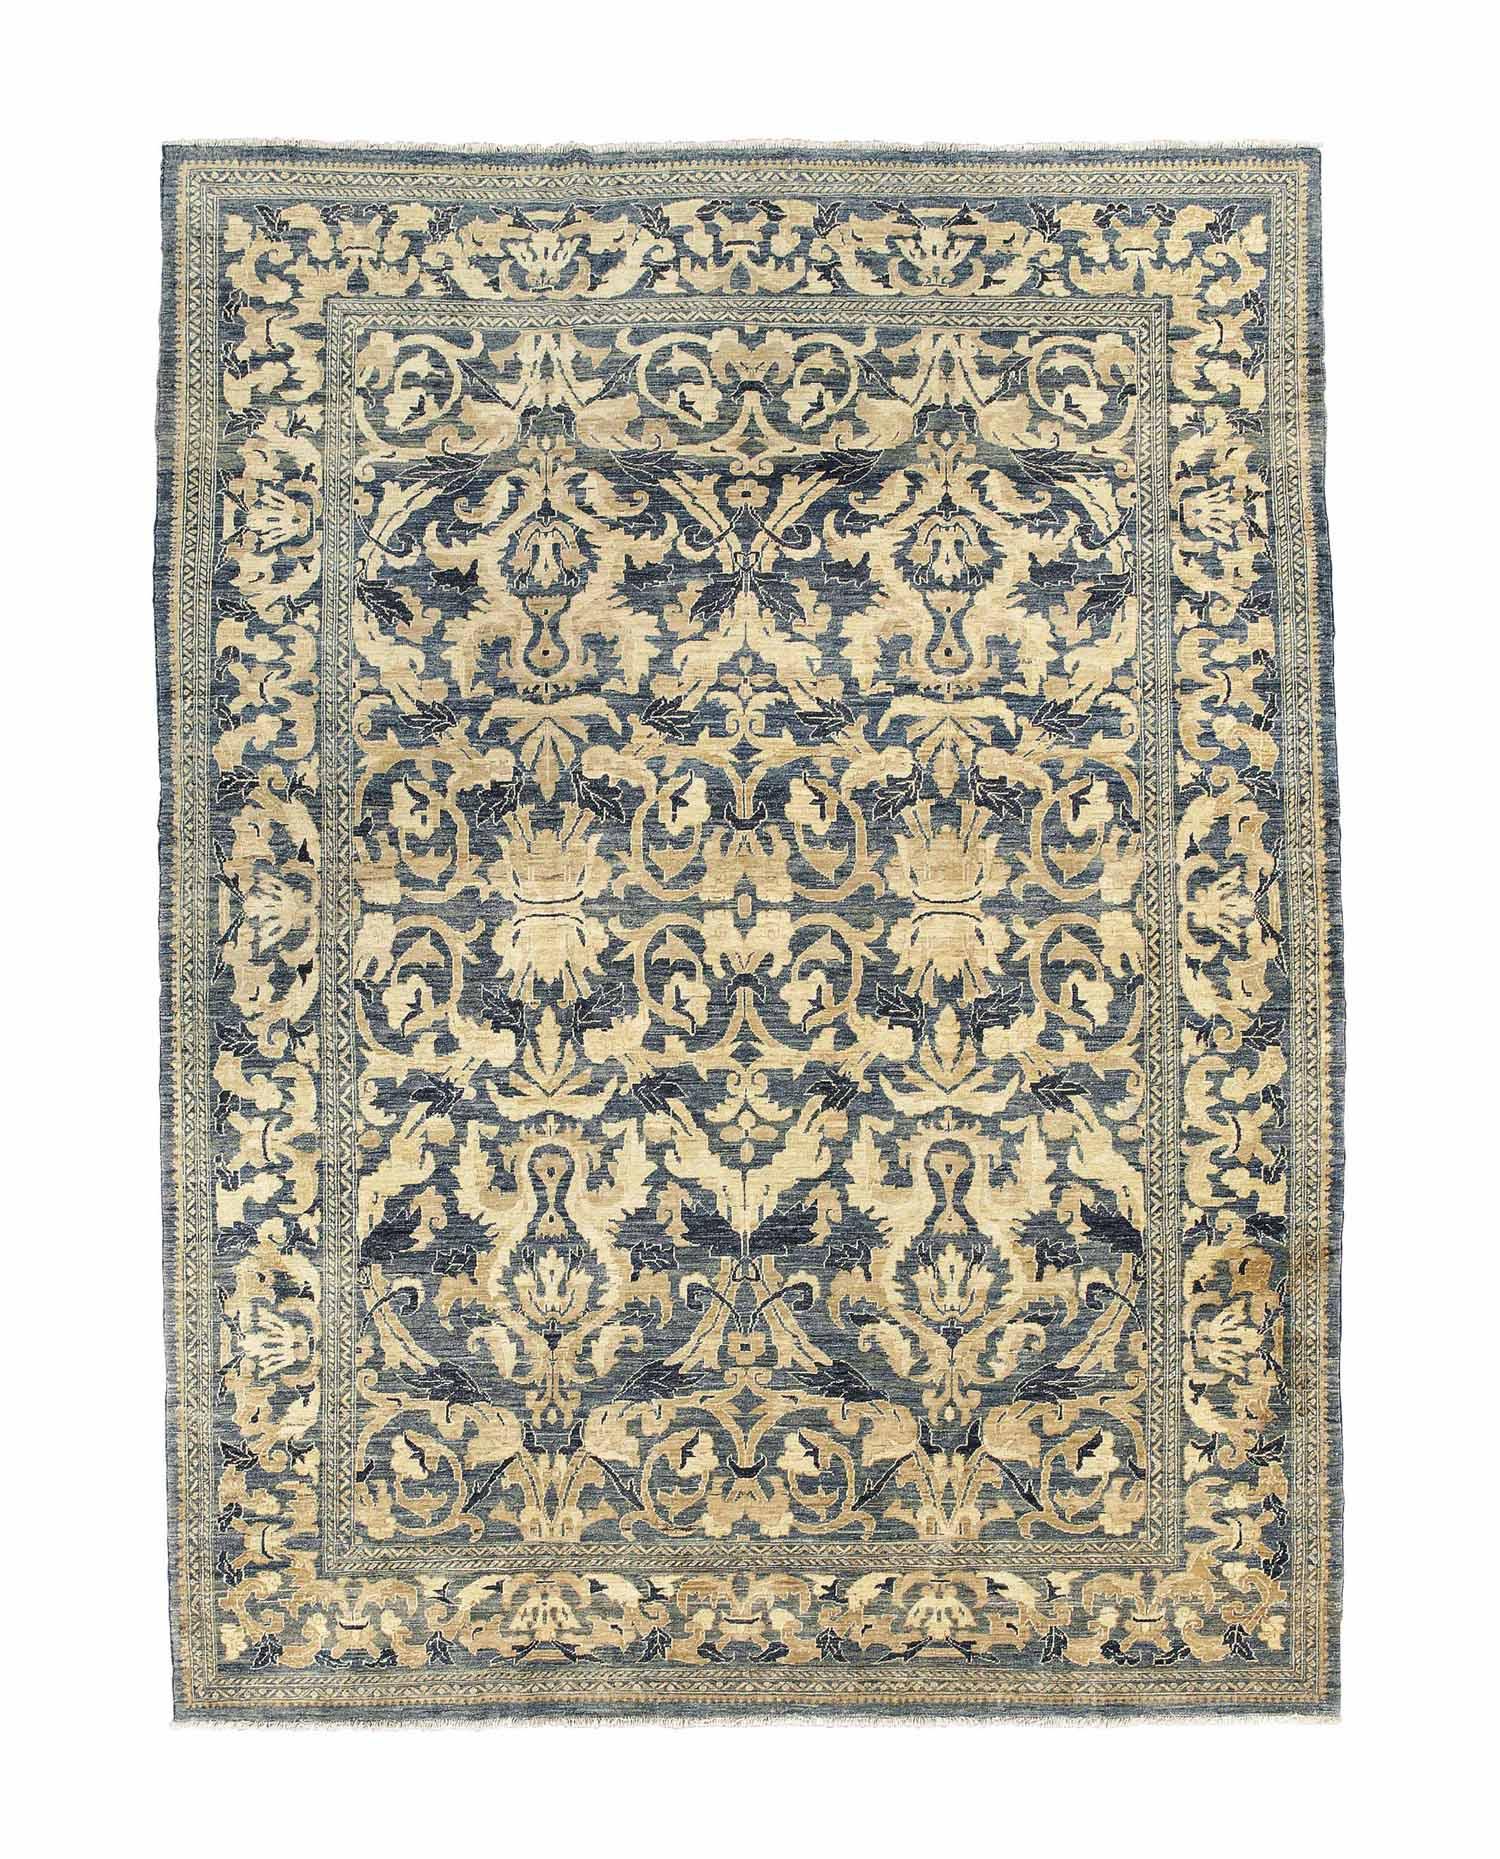 A fine carpet of stylised Zieg